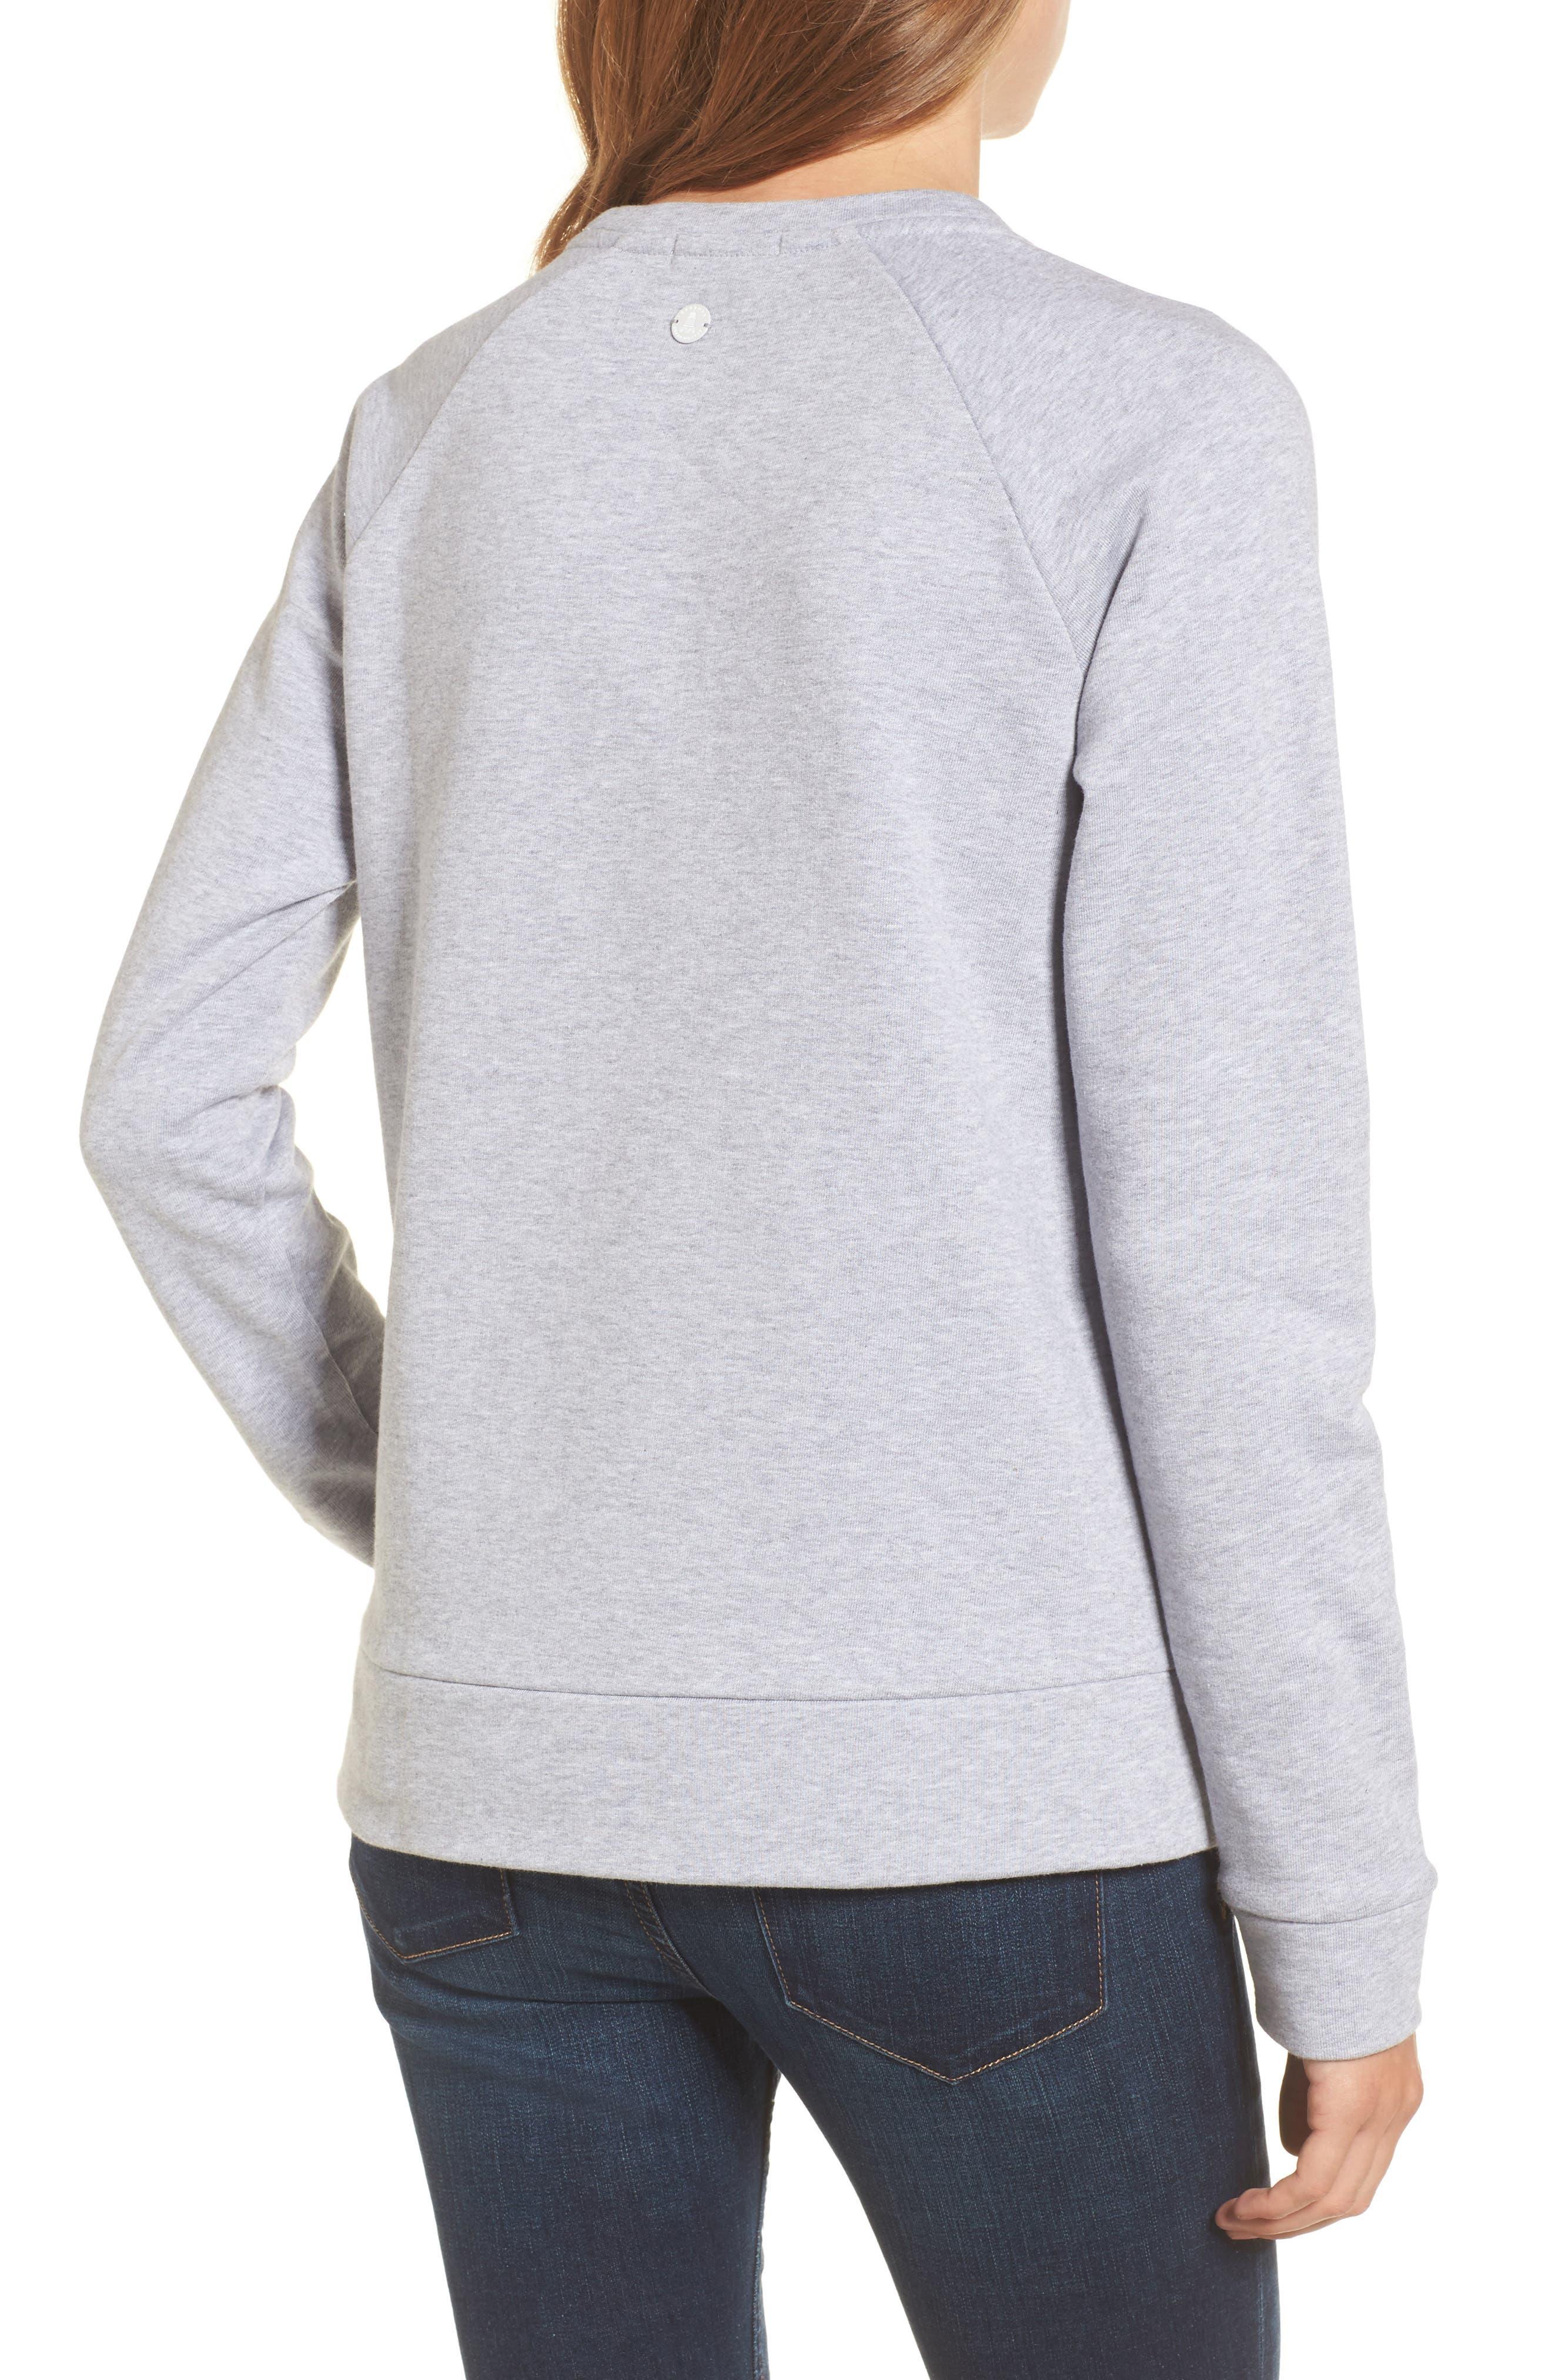 Wester Sweatshirt,                             Alternate thumbnail 2, color,                             050